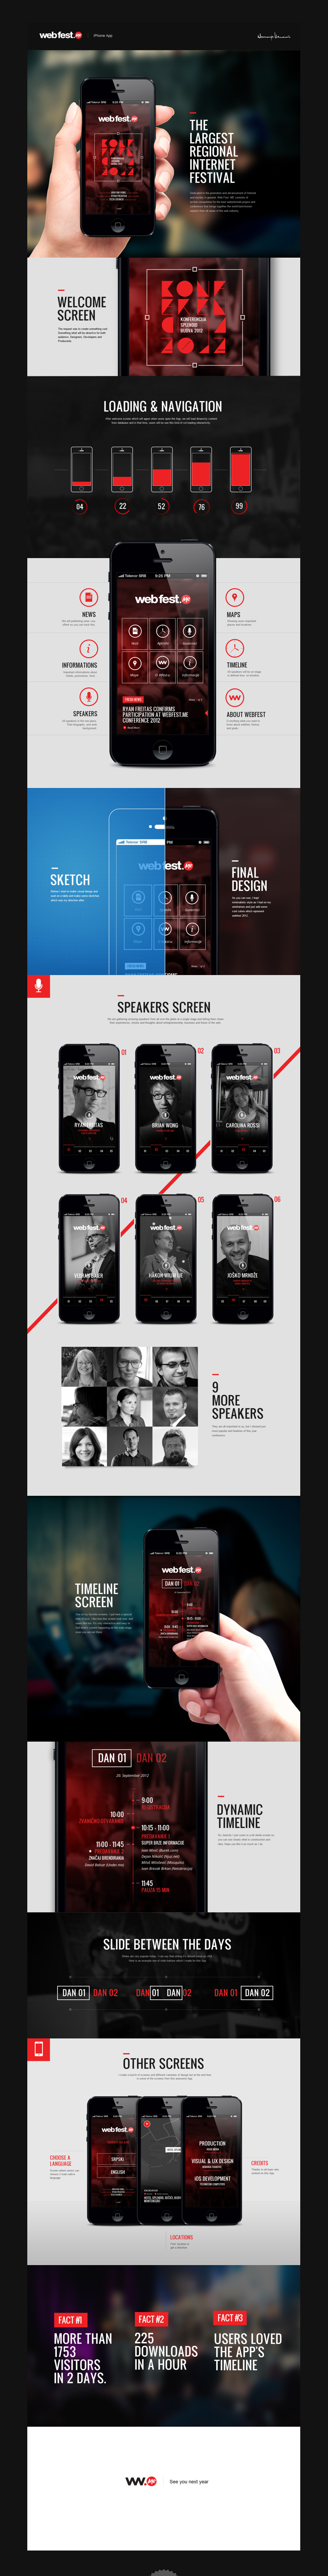 100 Best HOT APPS images in 2013 | Apps, Design web, Interface design